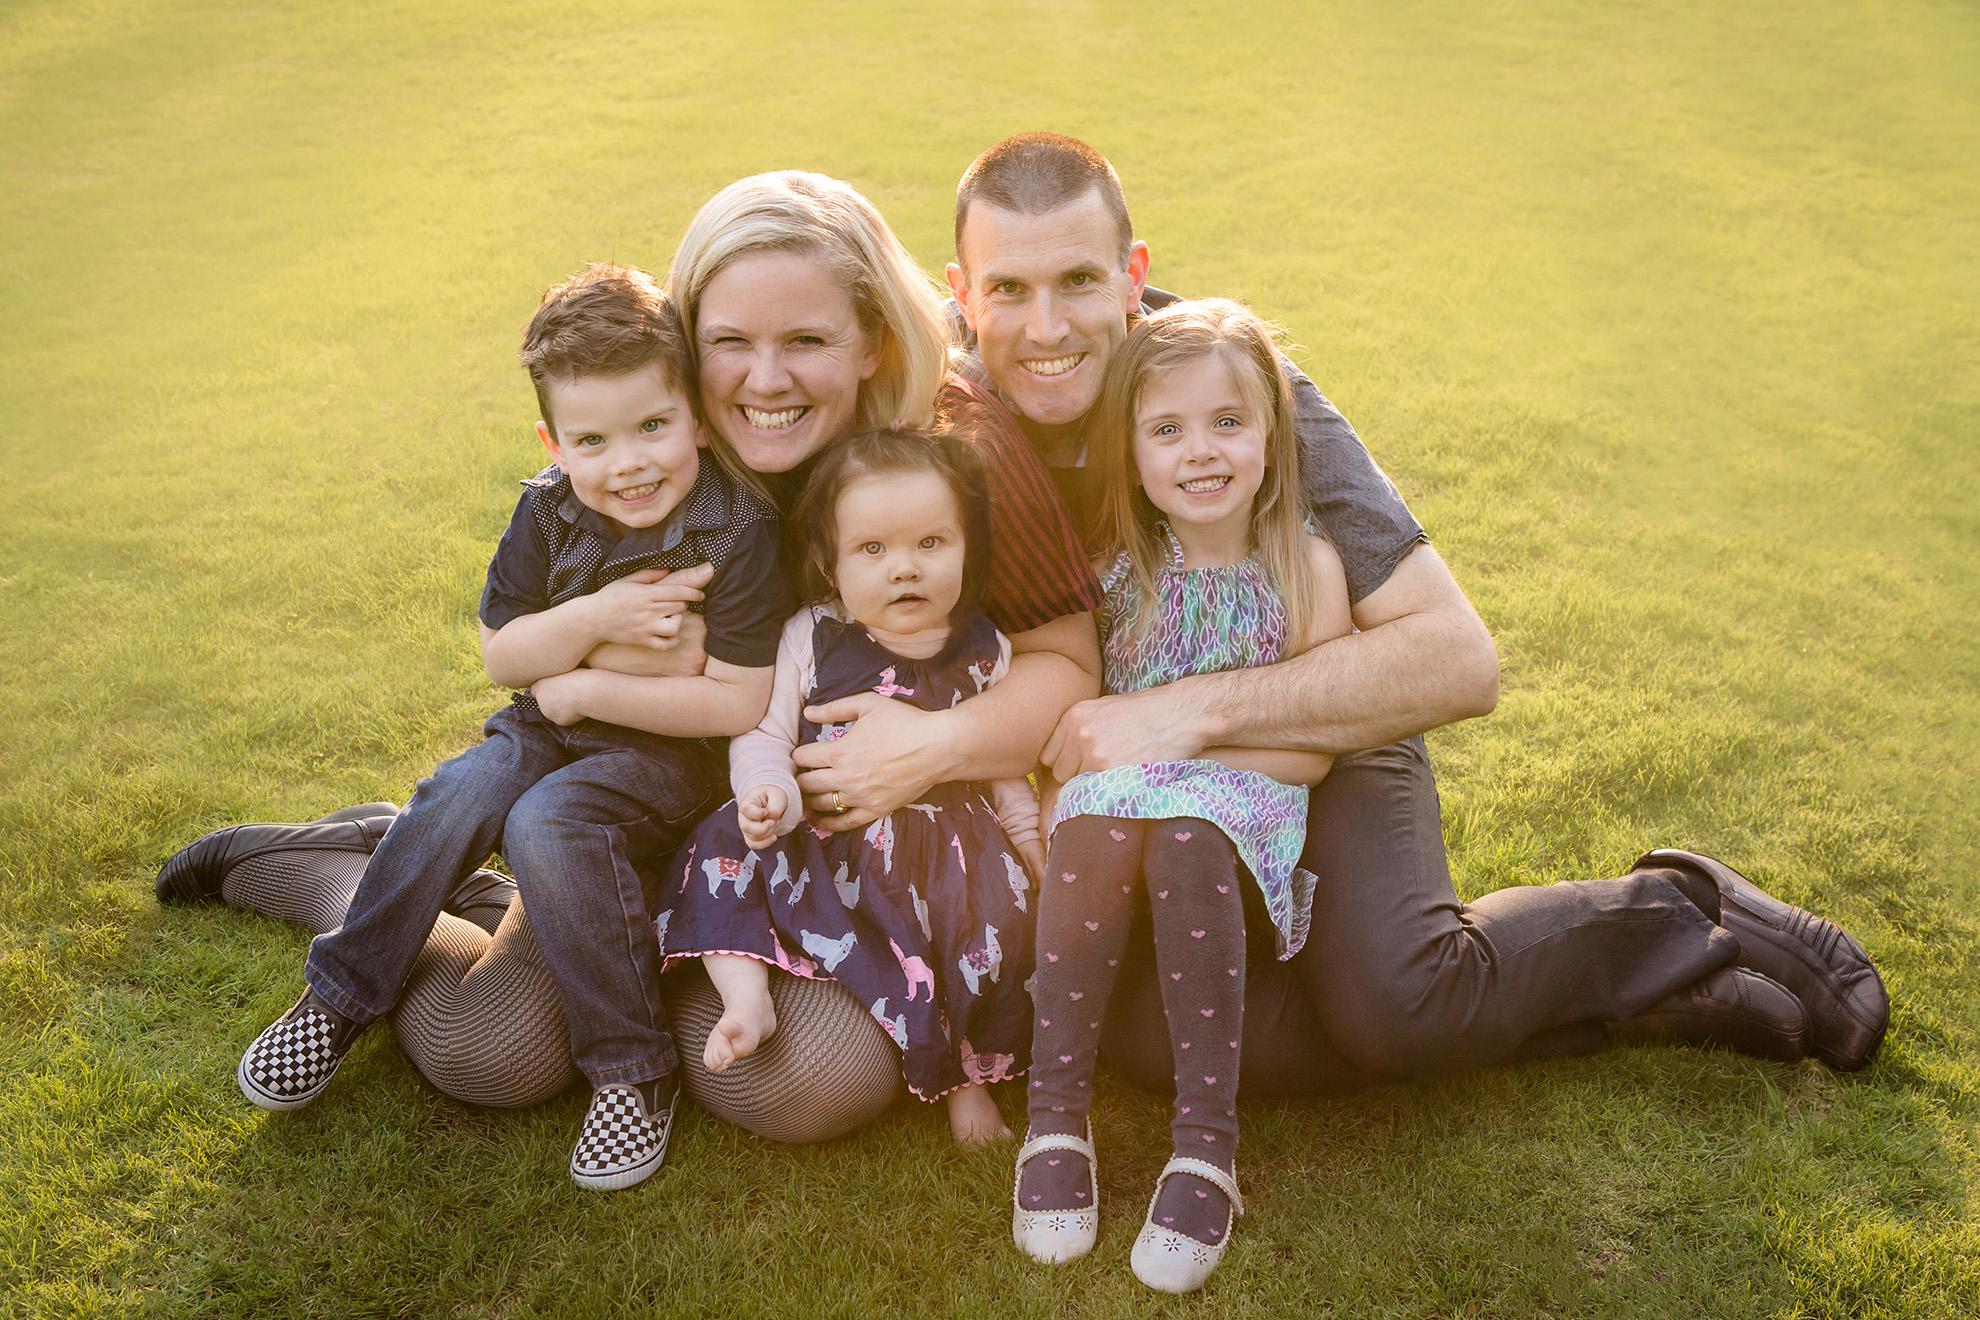 Cuttance family 01.jpg